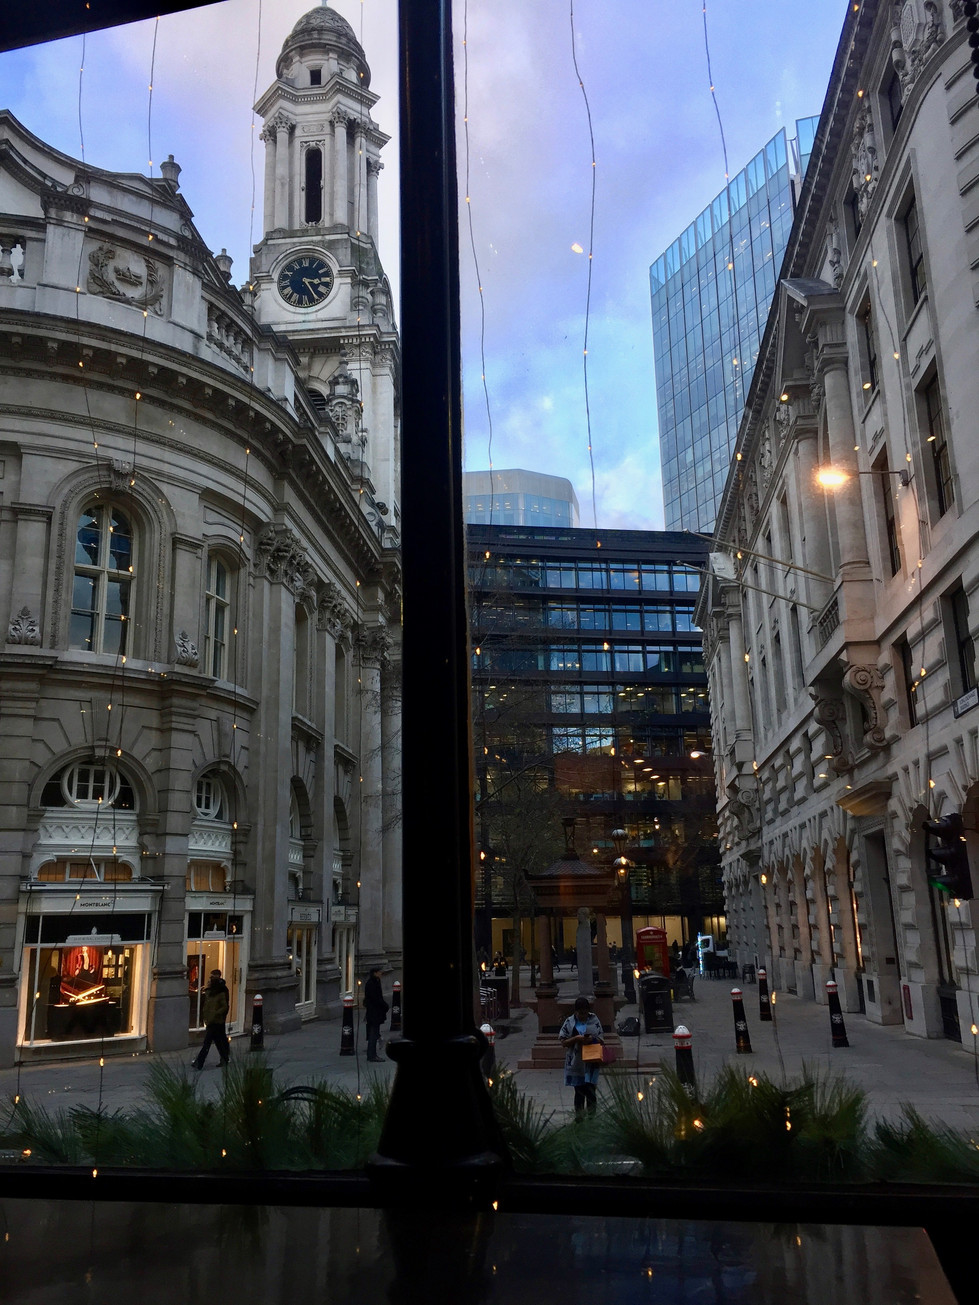 Bank Station in London 2 (런던 뱅크역  2| ロンドンのバンクー駅 2)